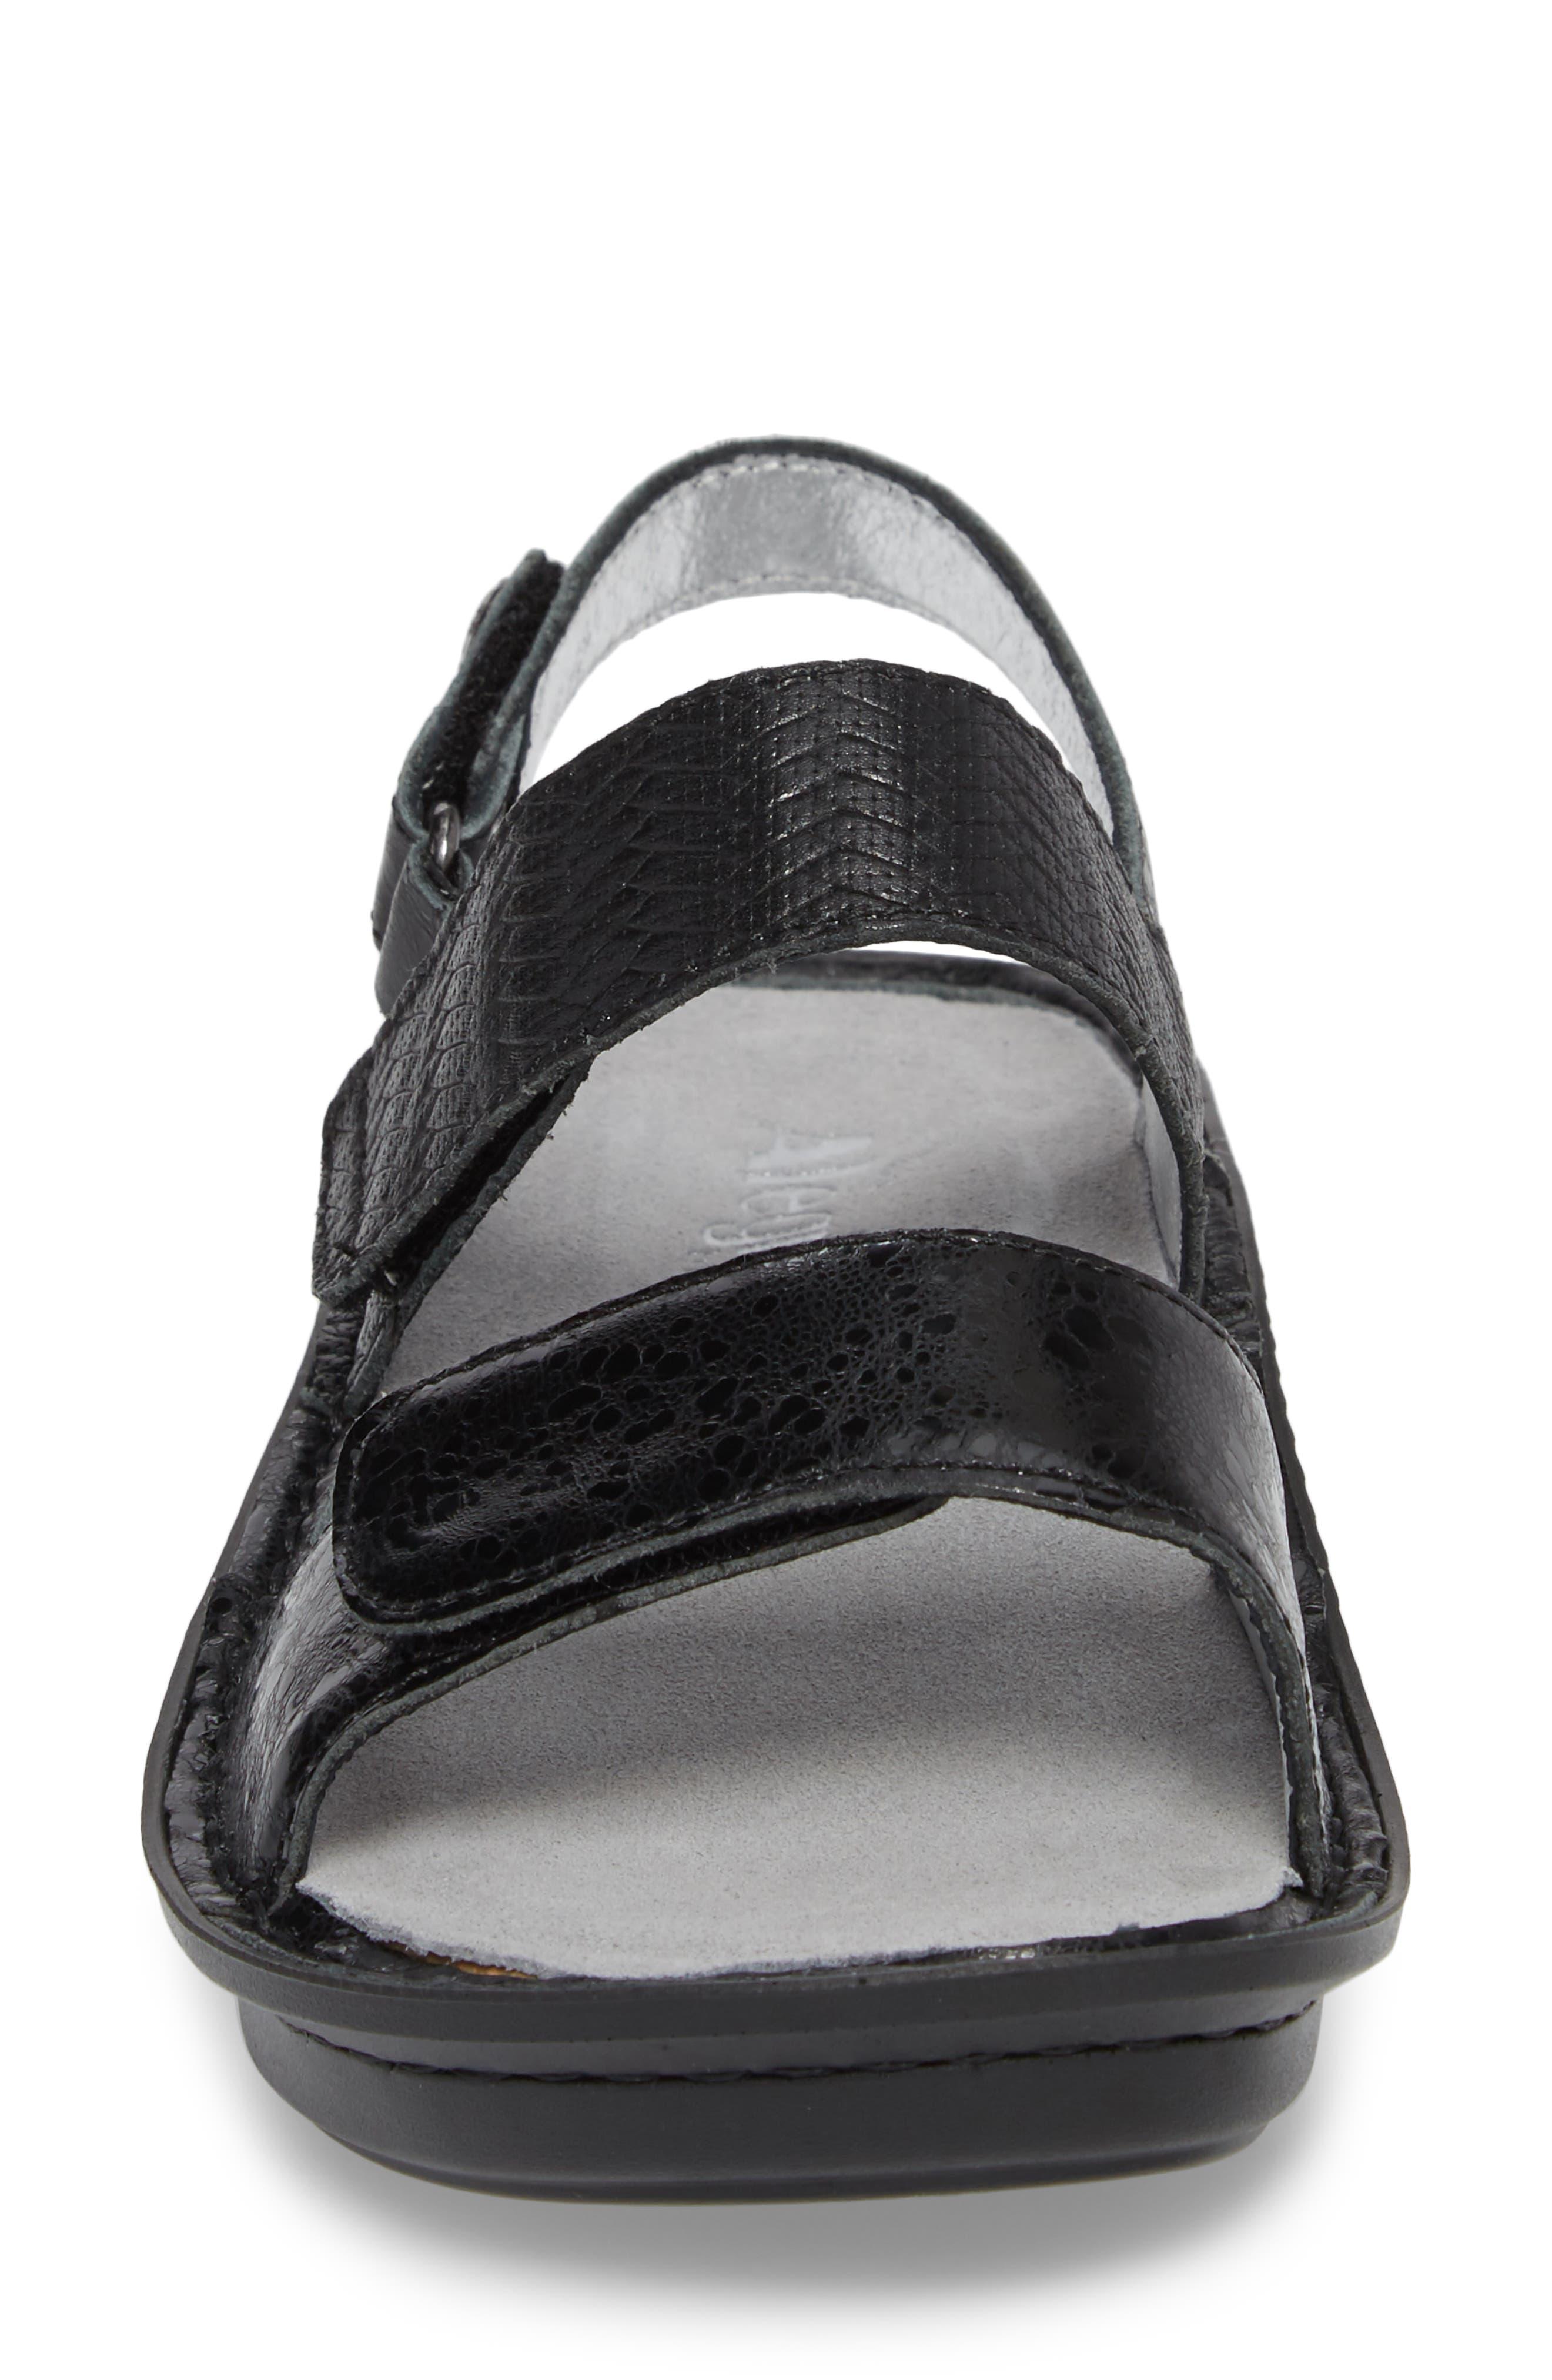 ALEGRIA, 'Verona' Sandal, Alternate thumbnail 4, color, BRAIDED BLACK LEATHER